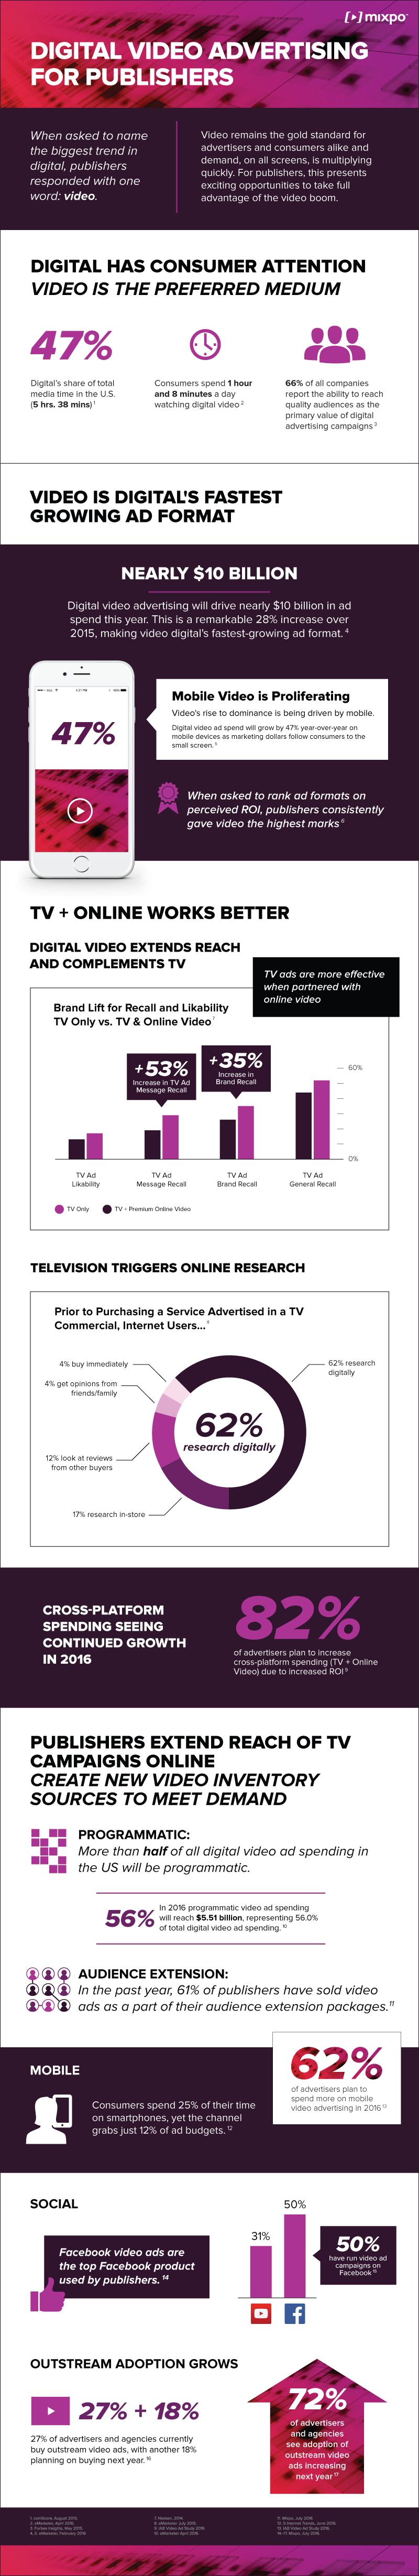 state of digital video advertising